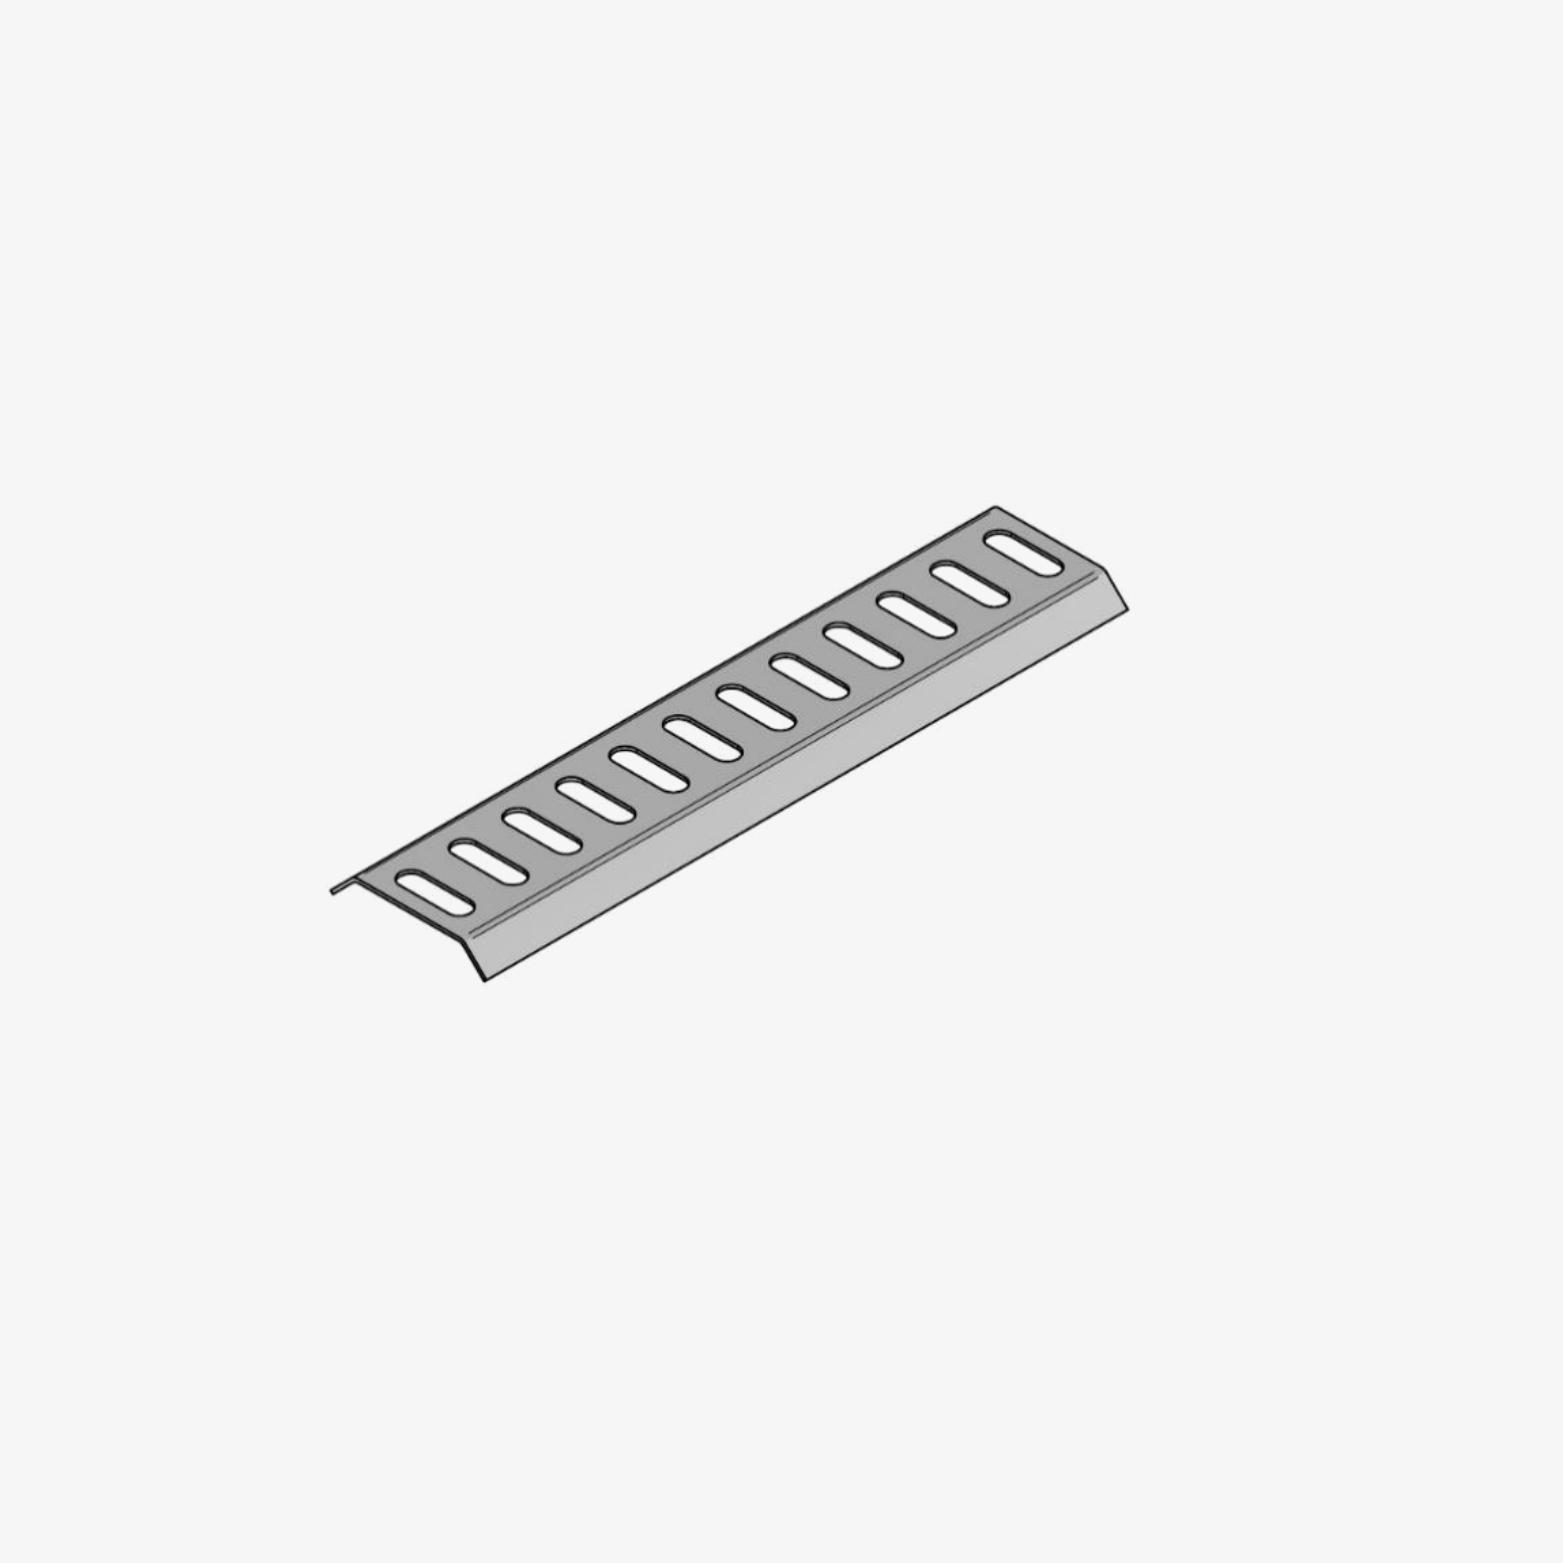 Trapez-Profilsteg, leicht